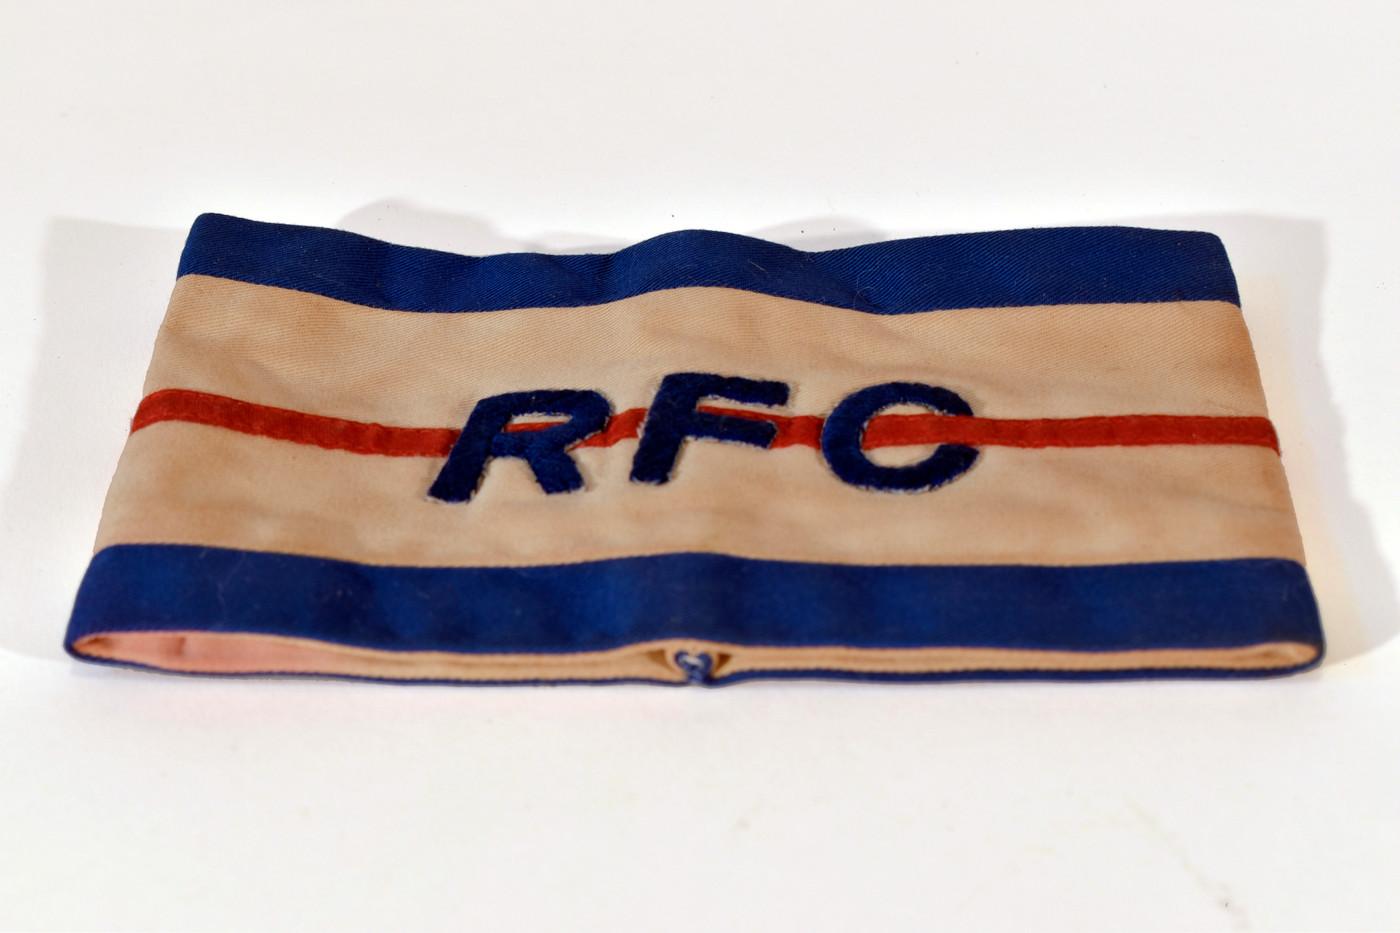 rfc armband b.jpg